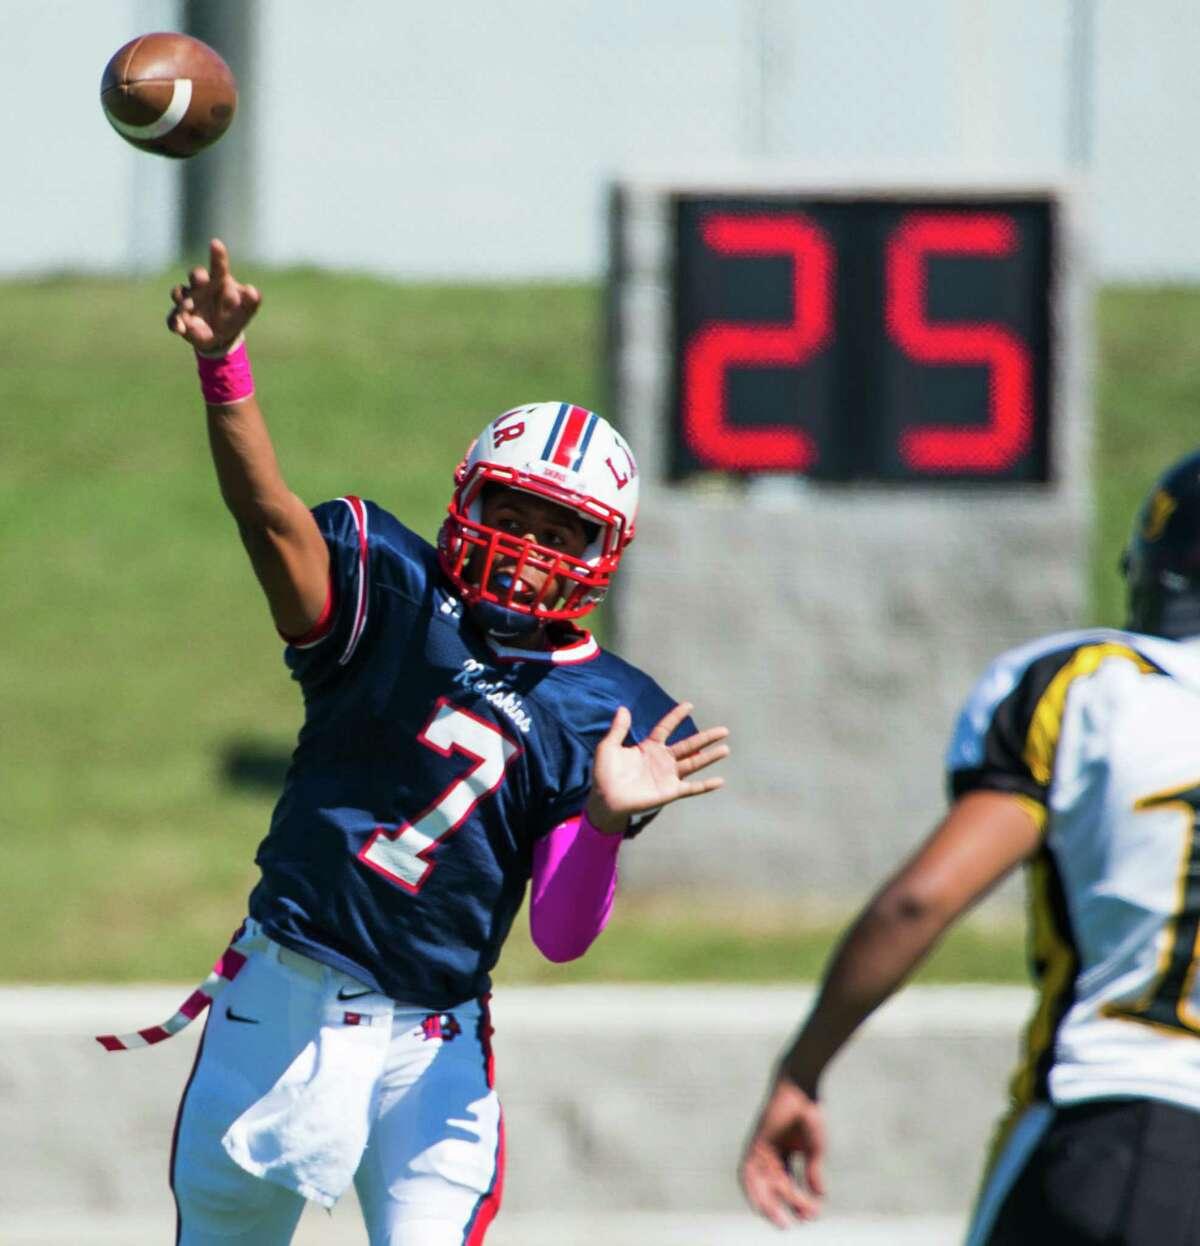 Lamar quarterback Darrell Colbert throws a pass during a high school football against Sam Houston at Delmar Stadium on Saturday, Oct. 19, 2013, in Houston. ( Smiley N. Pool / Houston Chronicle )